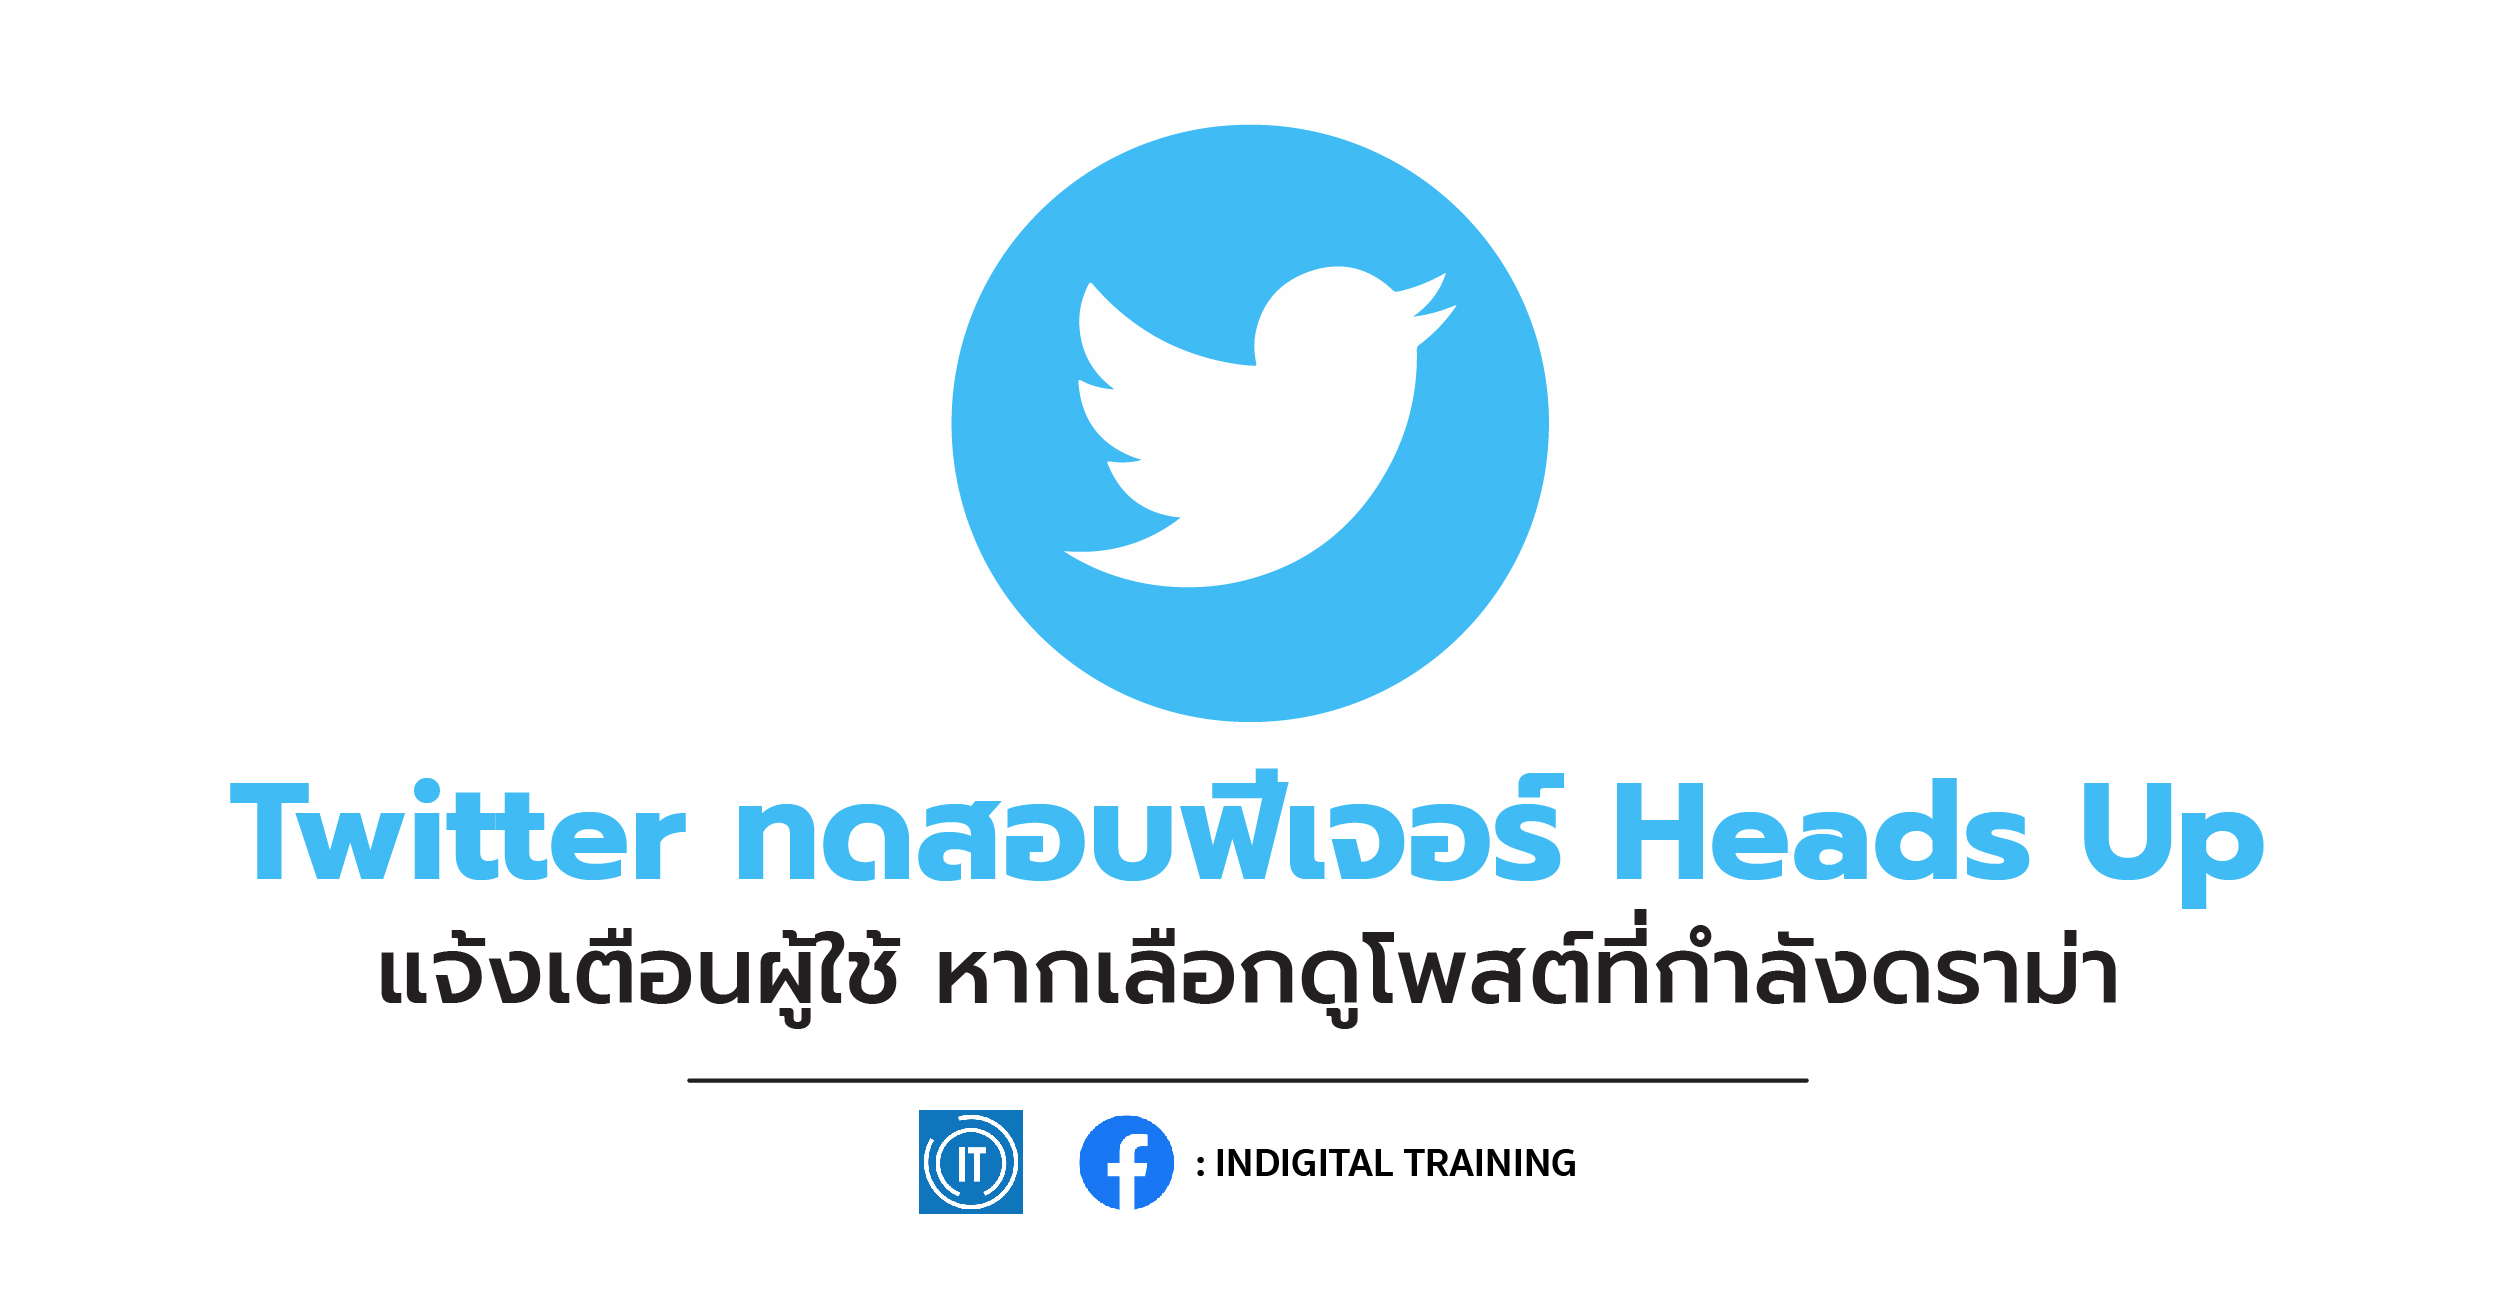 Twitter ทดสอบฟีเจอร์ Heads Up แจ้งเตือนผู้ใช้ หากเลือกดูโพสต์ที่กำลังดราม่า